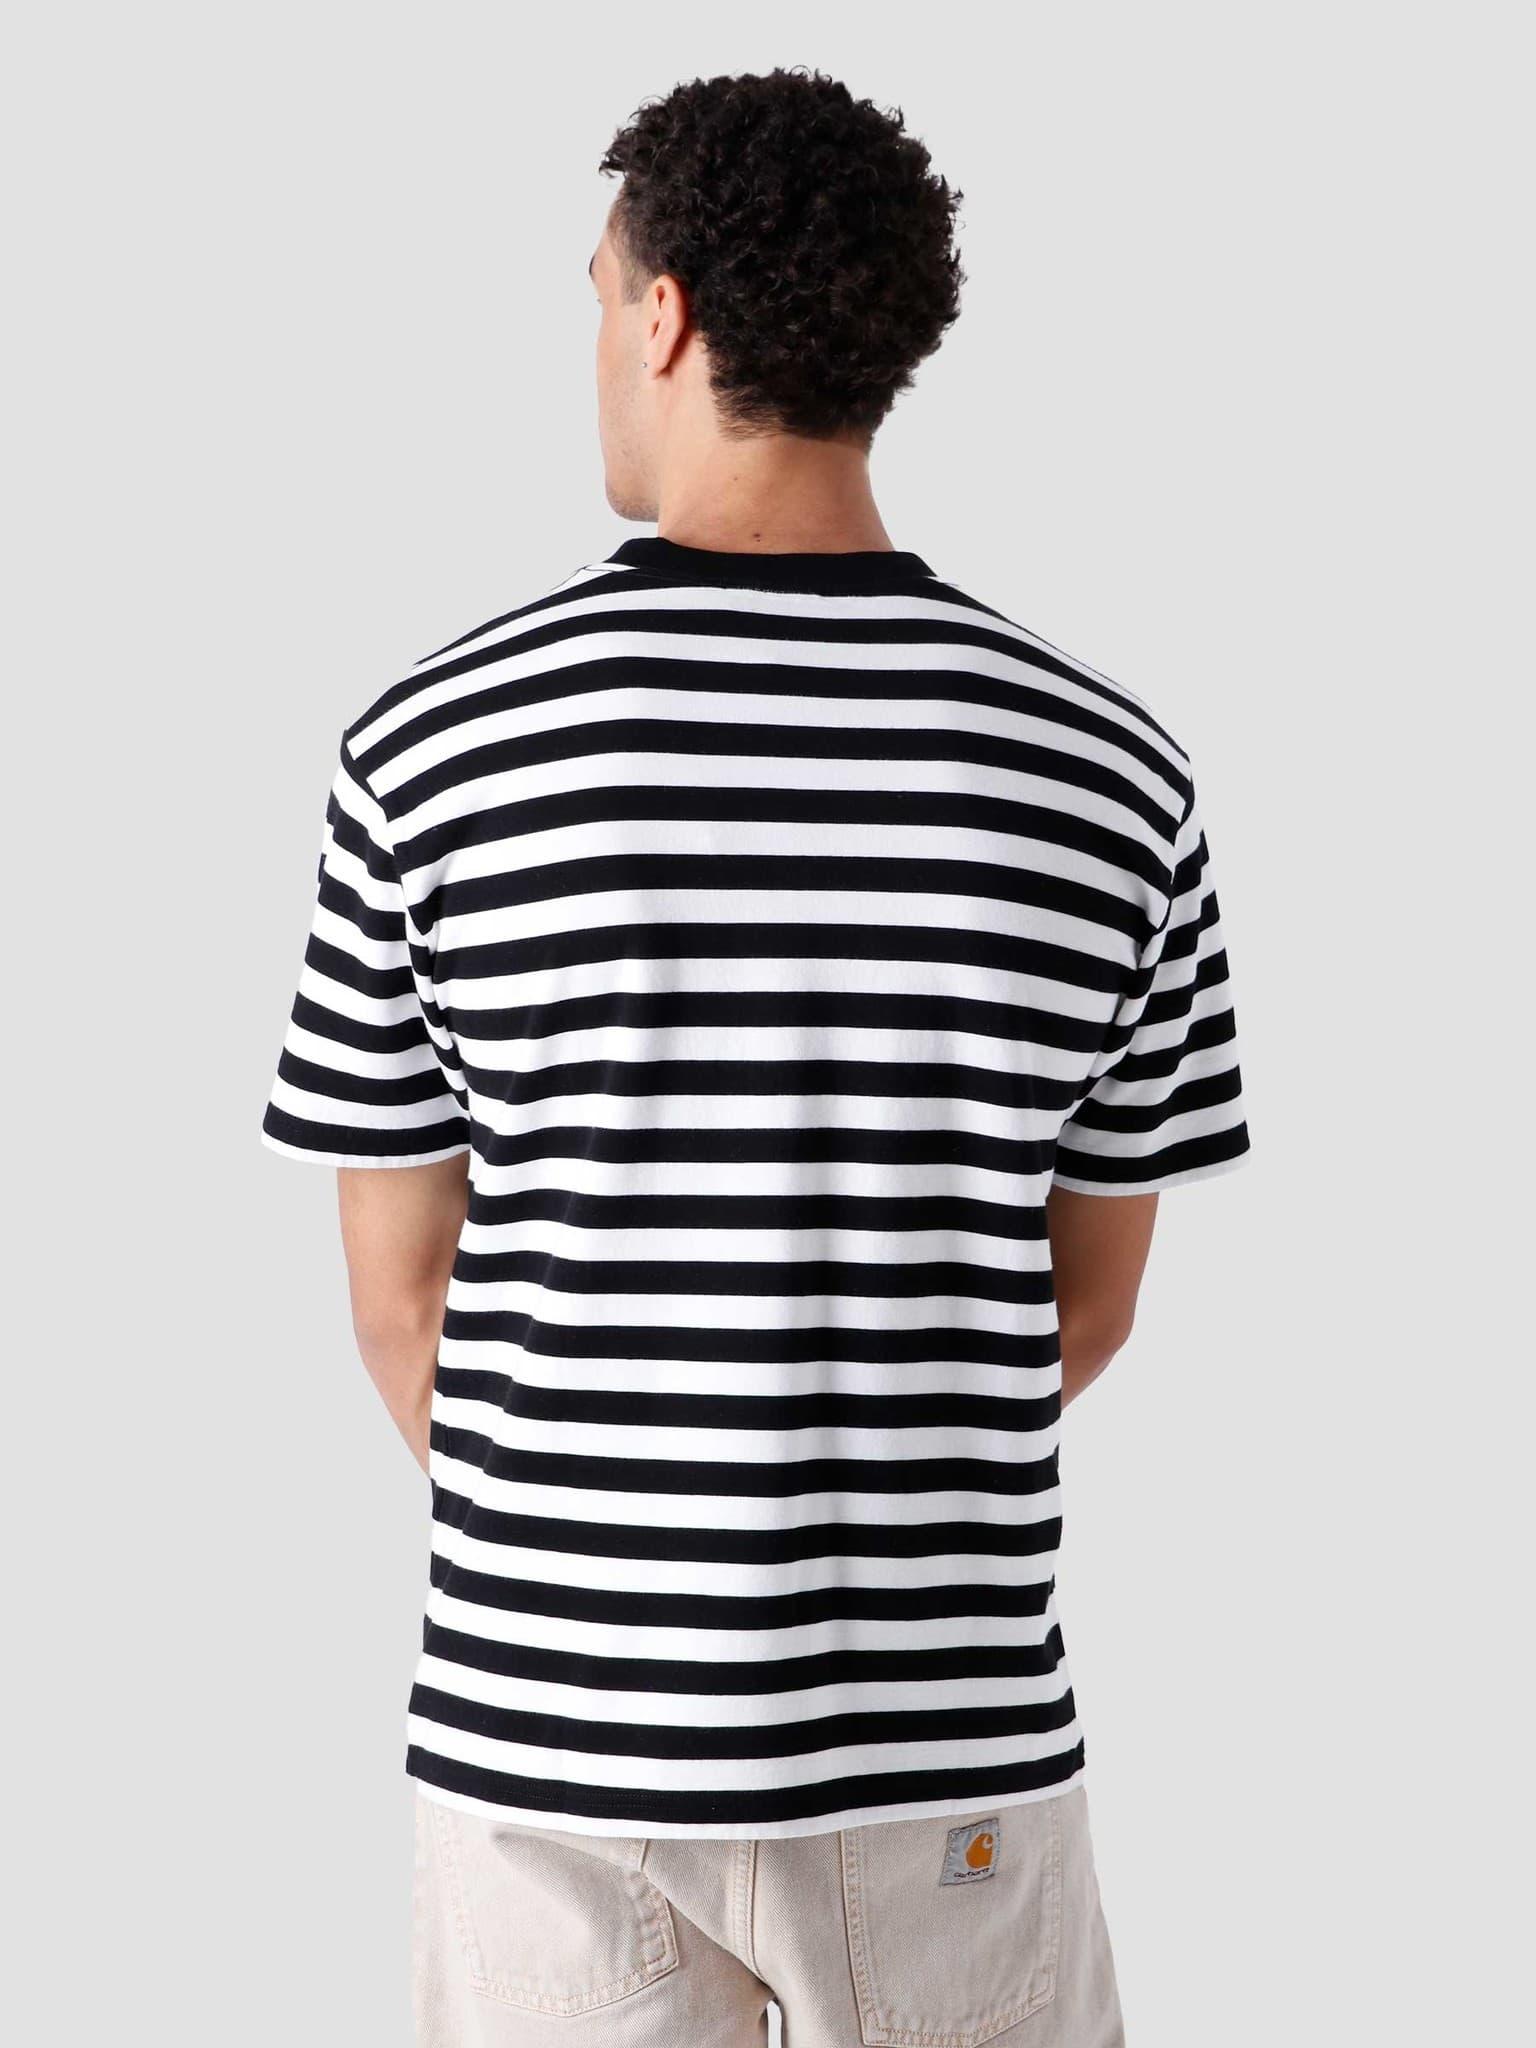 Stripe Sans T-Shirt White Black